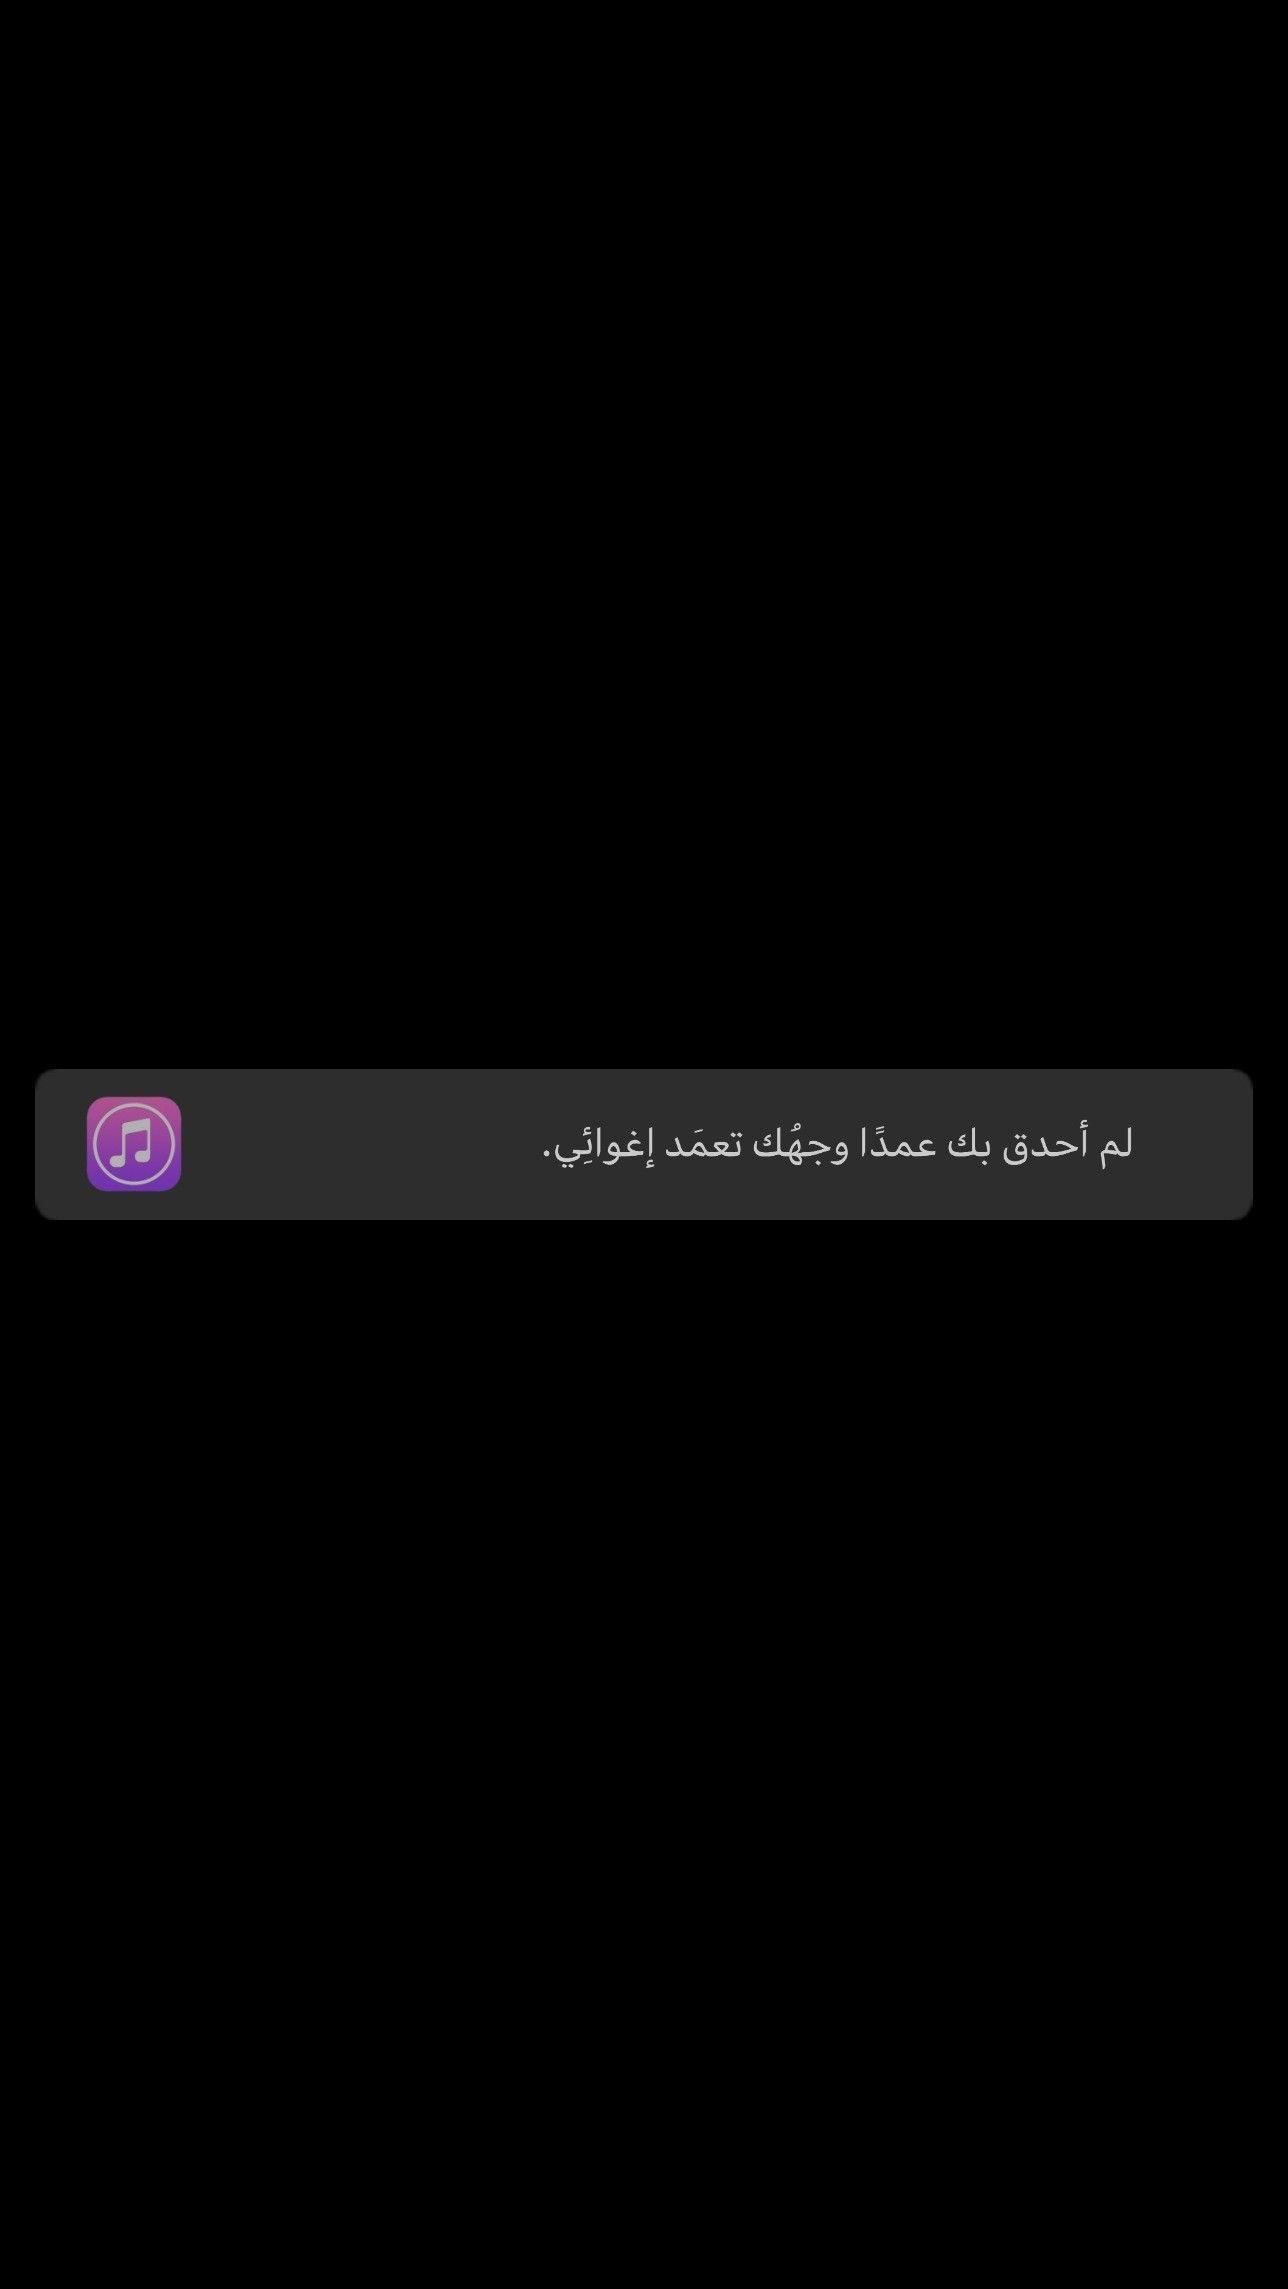 اقتباسات تليجرام تمبلر خواطر حكم ستوري سنابات خلفيات سوداء بنات افتارات ستو Calligraphy Quotes Love Quran Quotes Inspirational Love You Best Friend